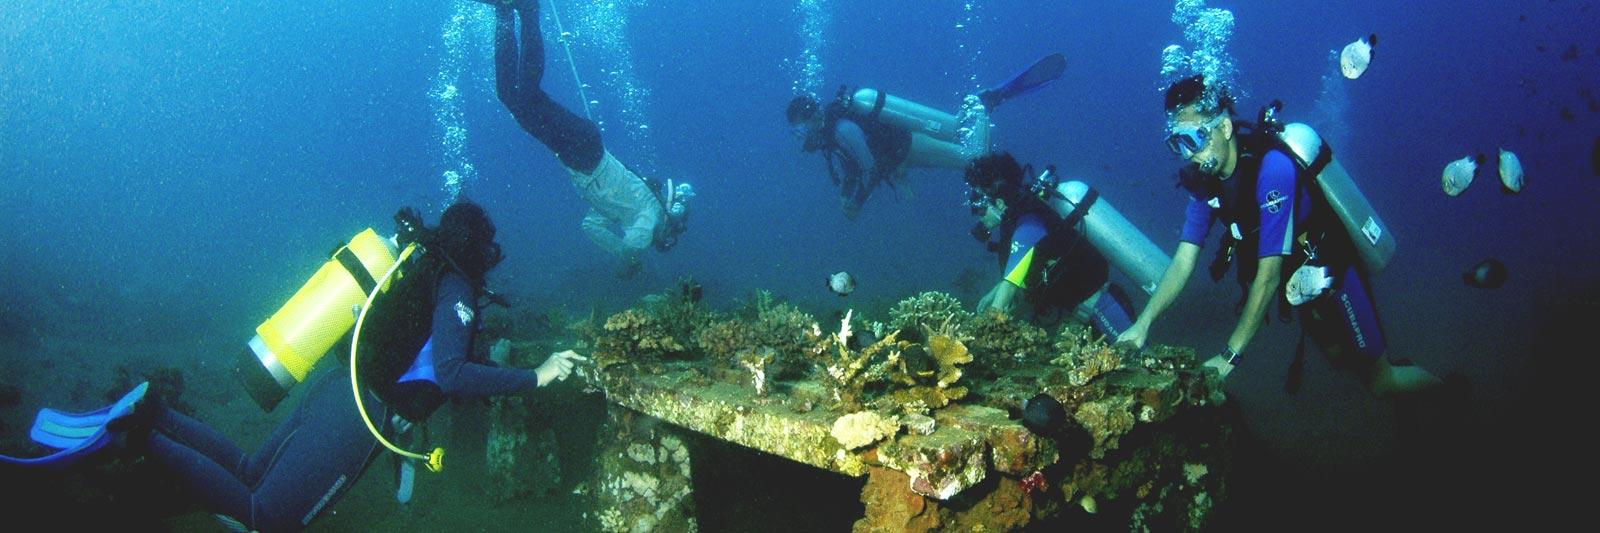 Sea Communities